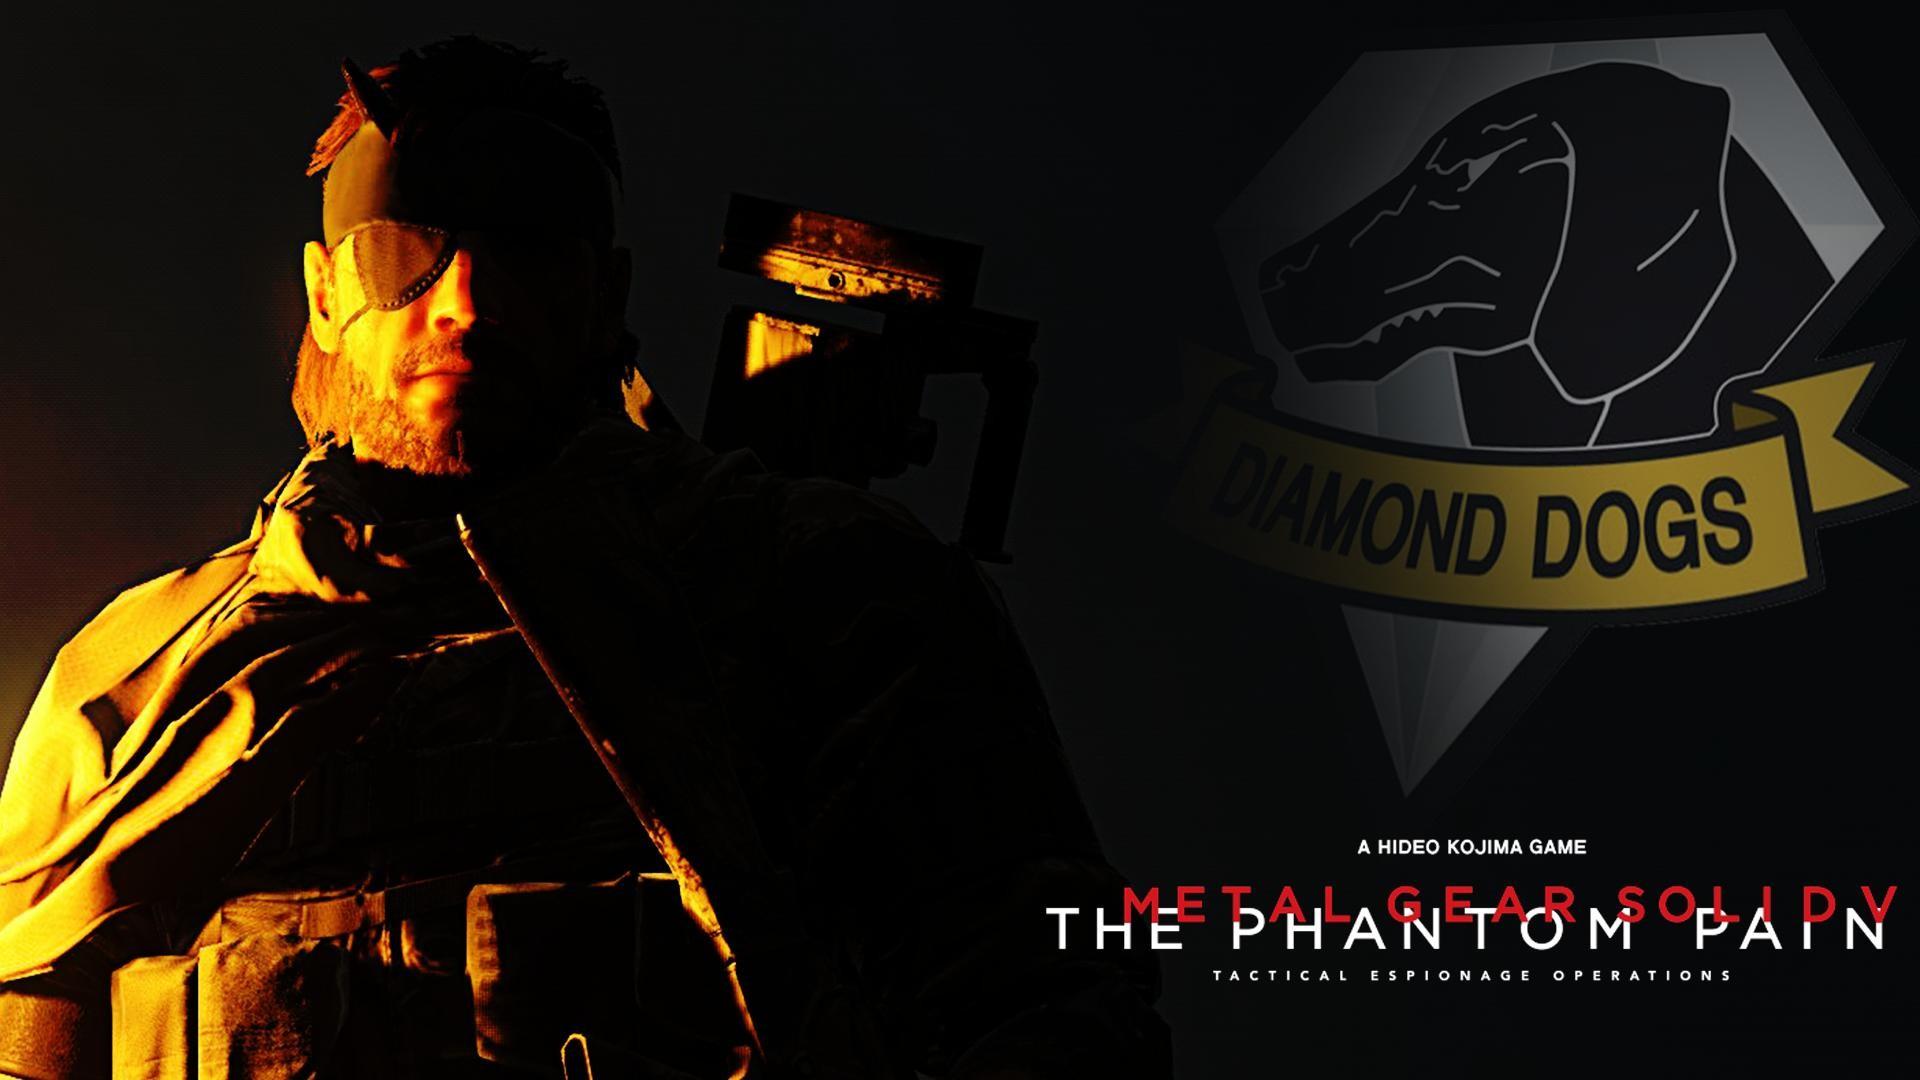 MGSV The Phantom Pain Custom Wallpaper Need #iPhone #6S #Plus # Wallpaper